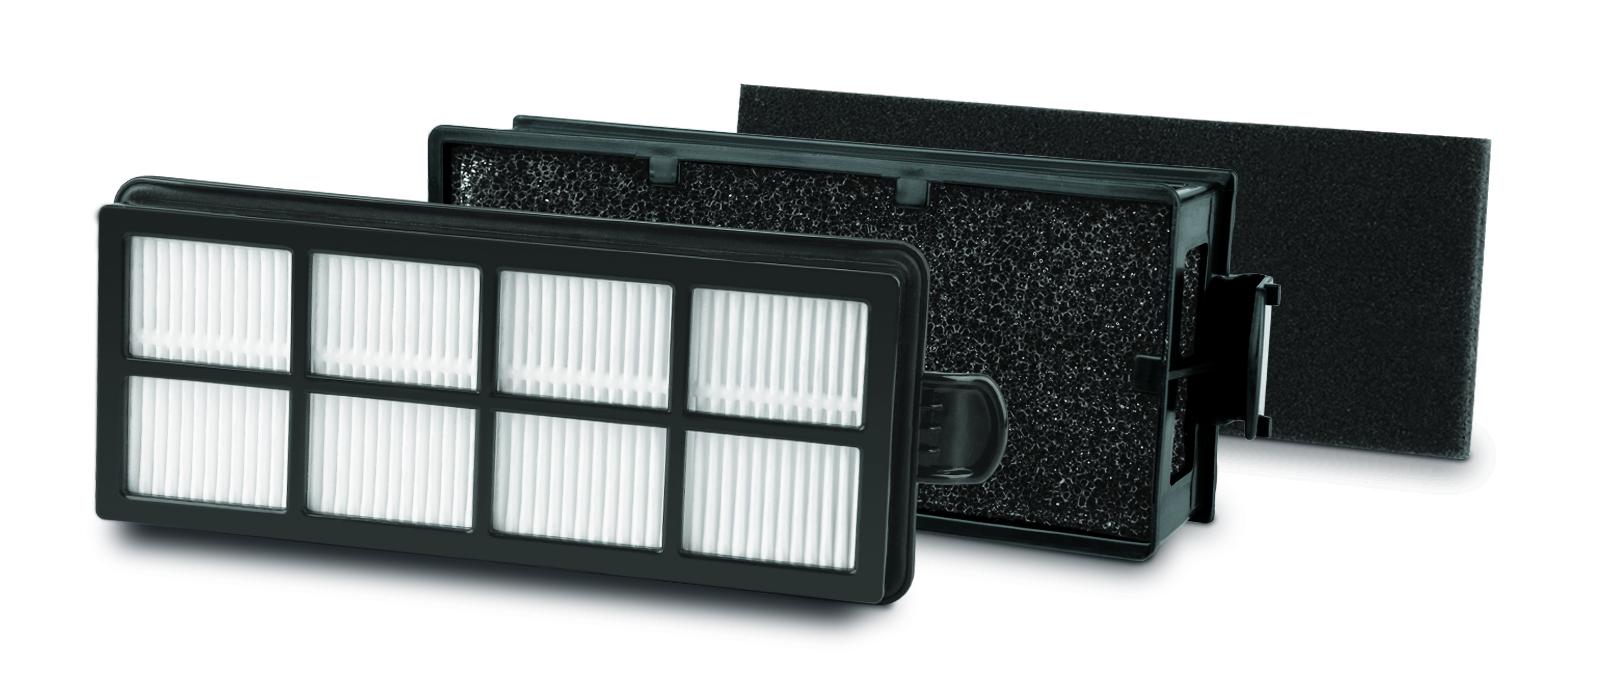 Vitek VT-1863 BK, Black фильтр для пылесоса VT-1863(BK)